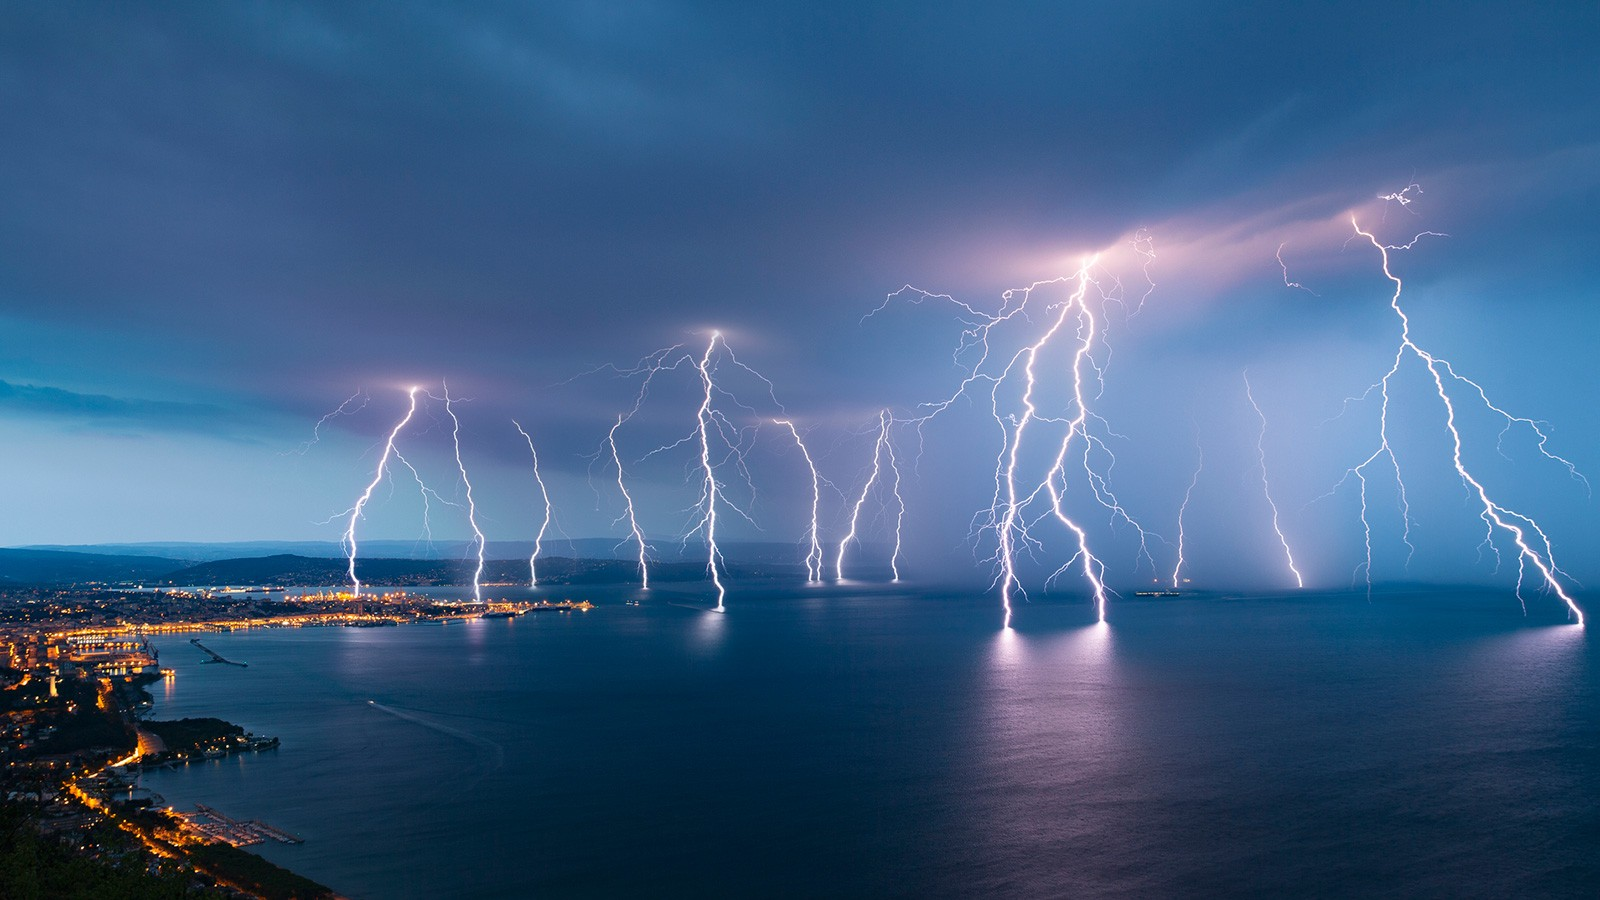 lightning storm over water